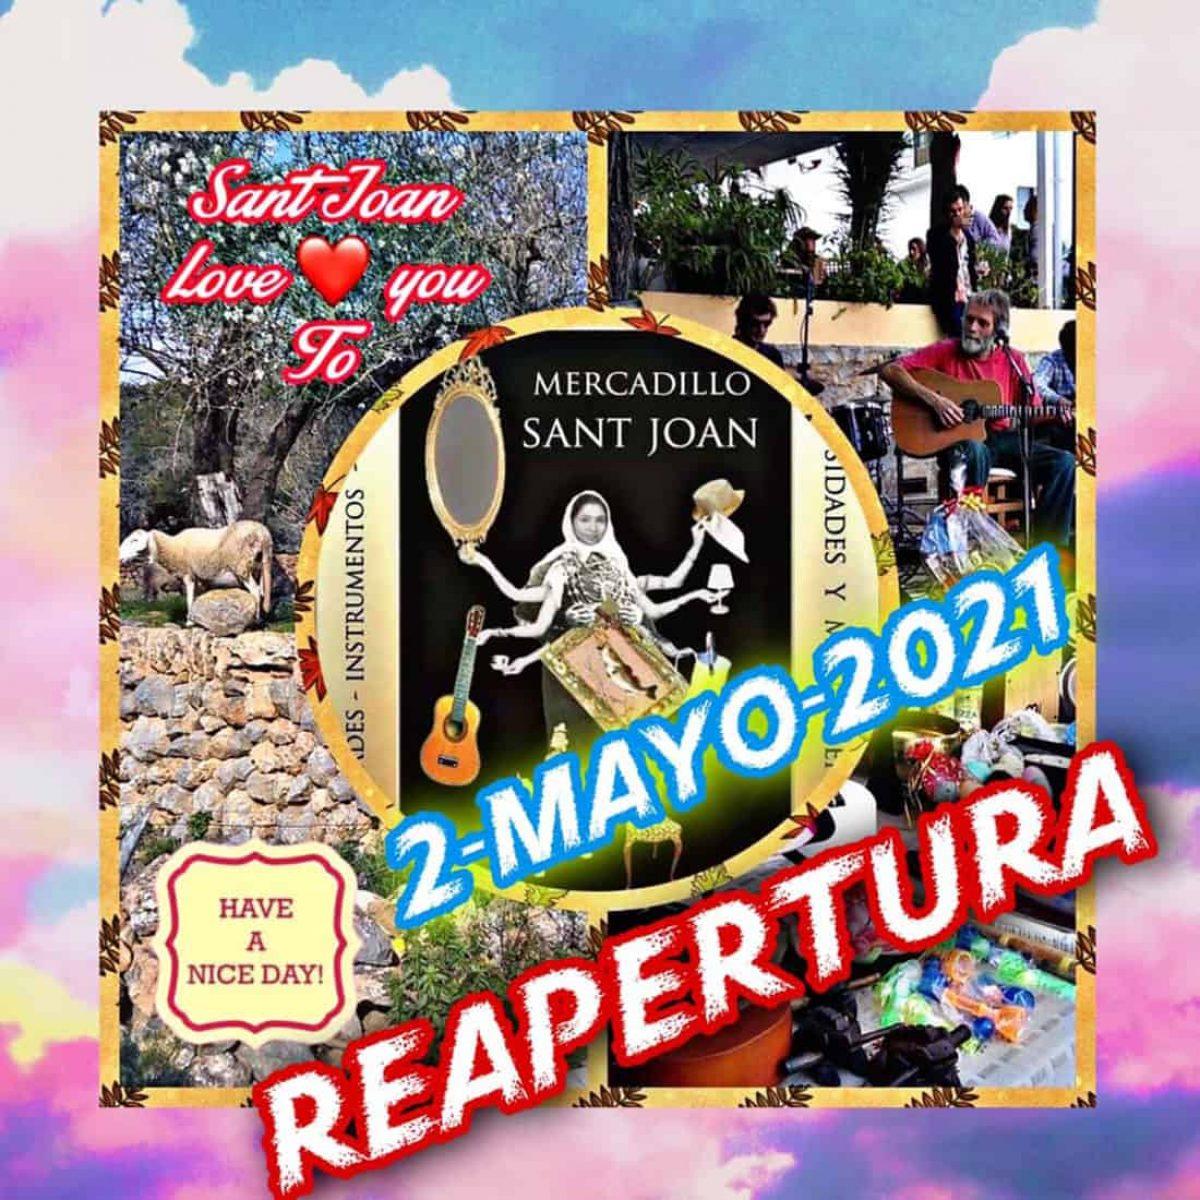 heropening-markt-san-juan-ibiza-2021-welcometoibiza